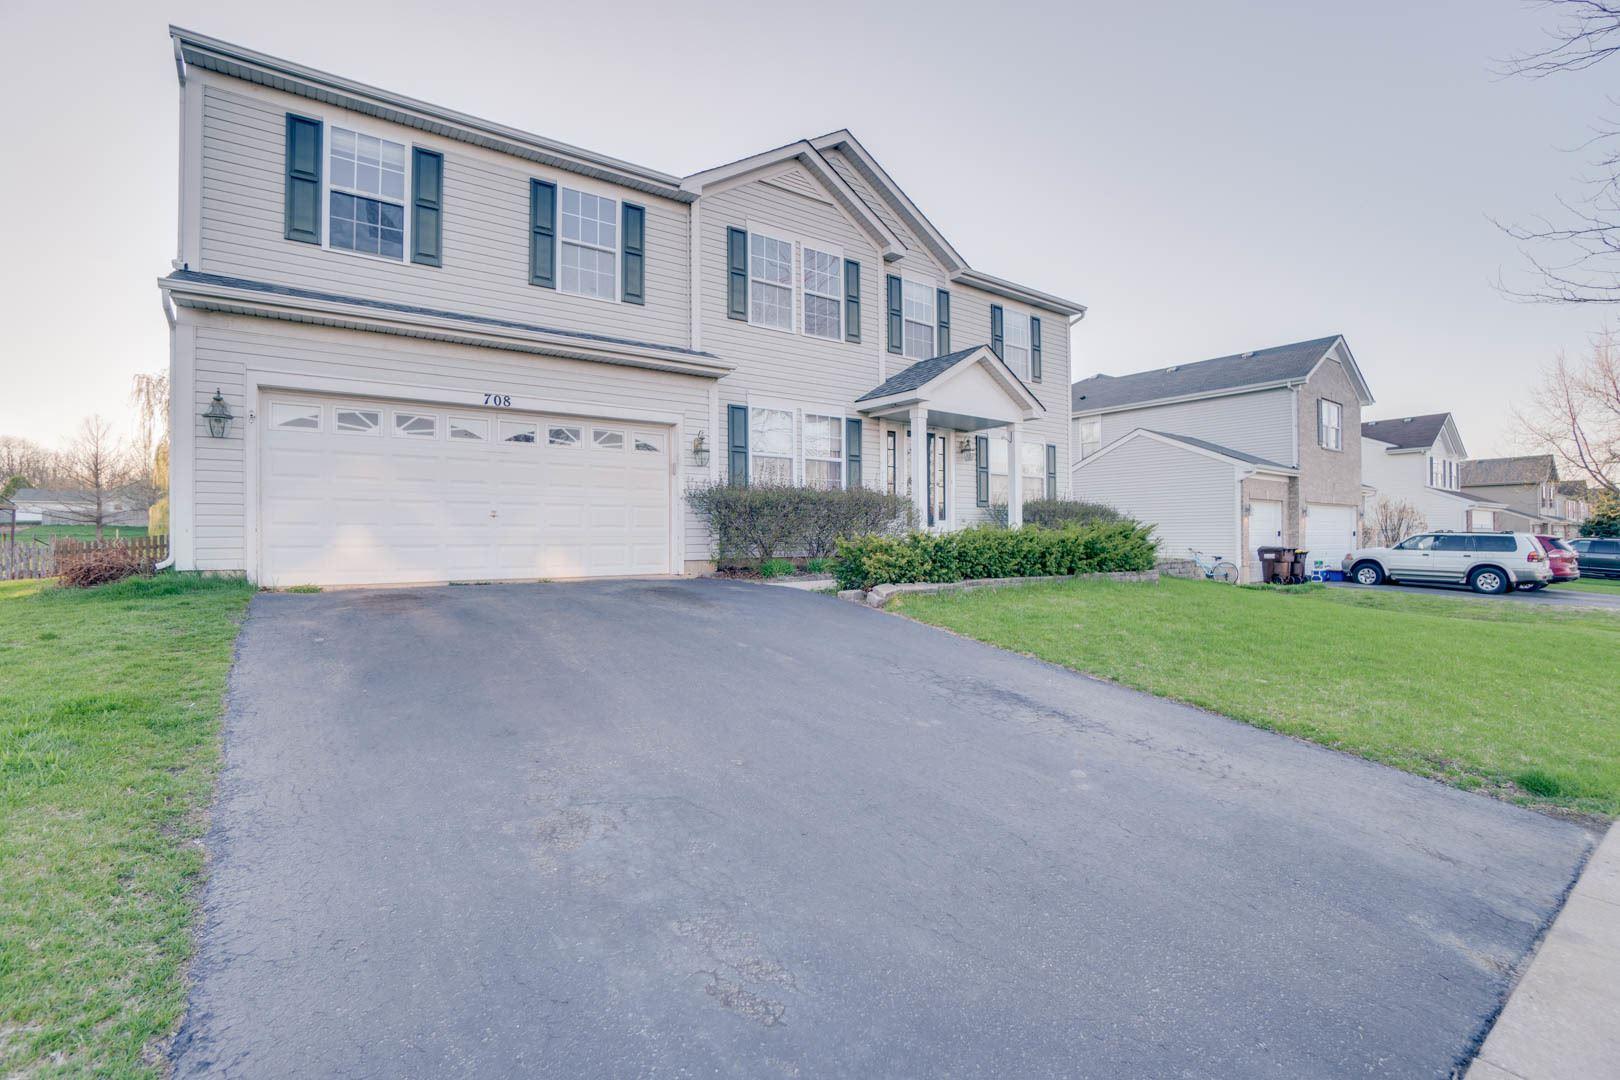 708 Ridge Drive, Marengo, IL 60152 - #: 11055476